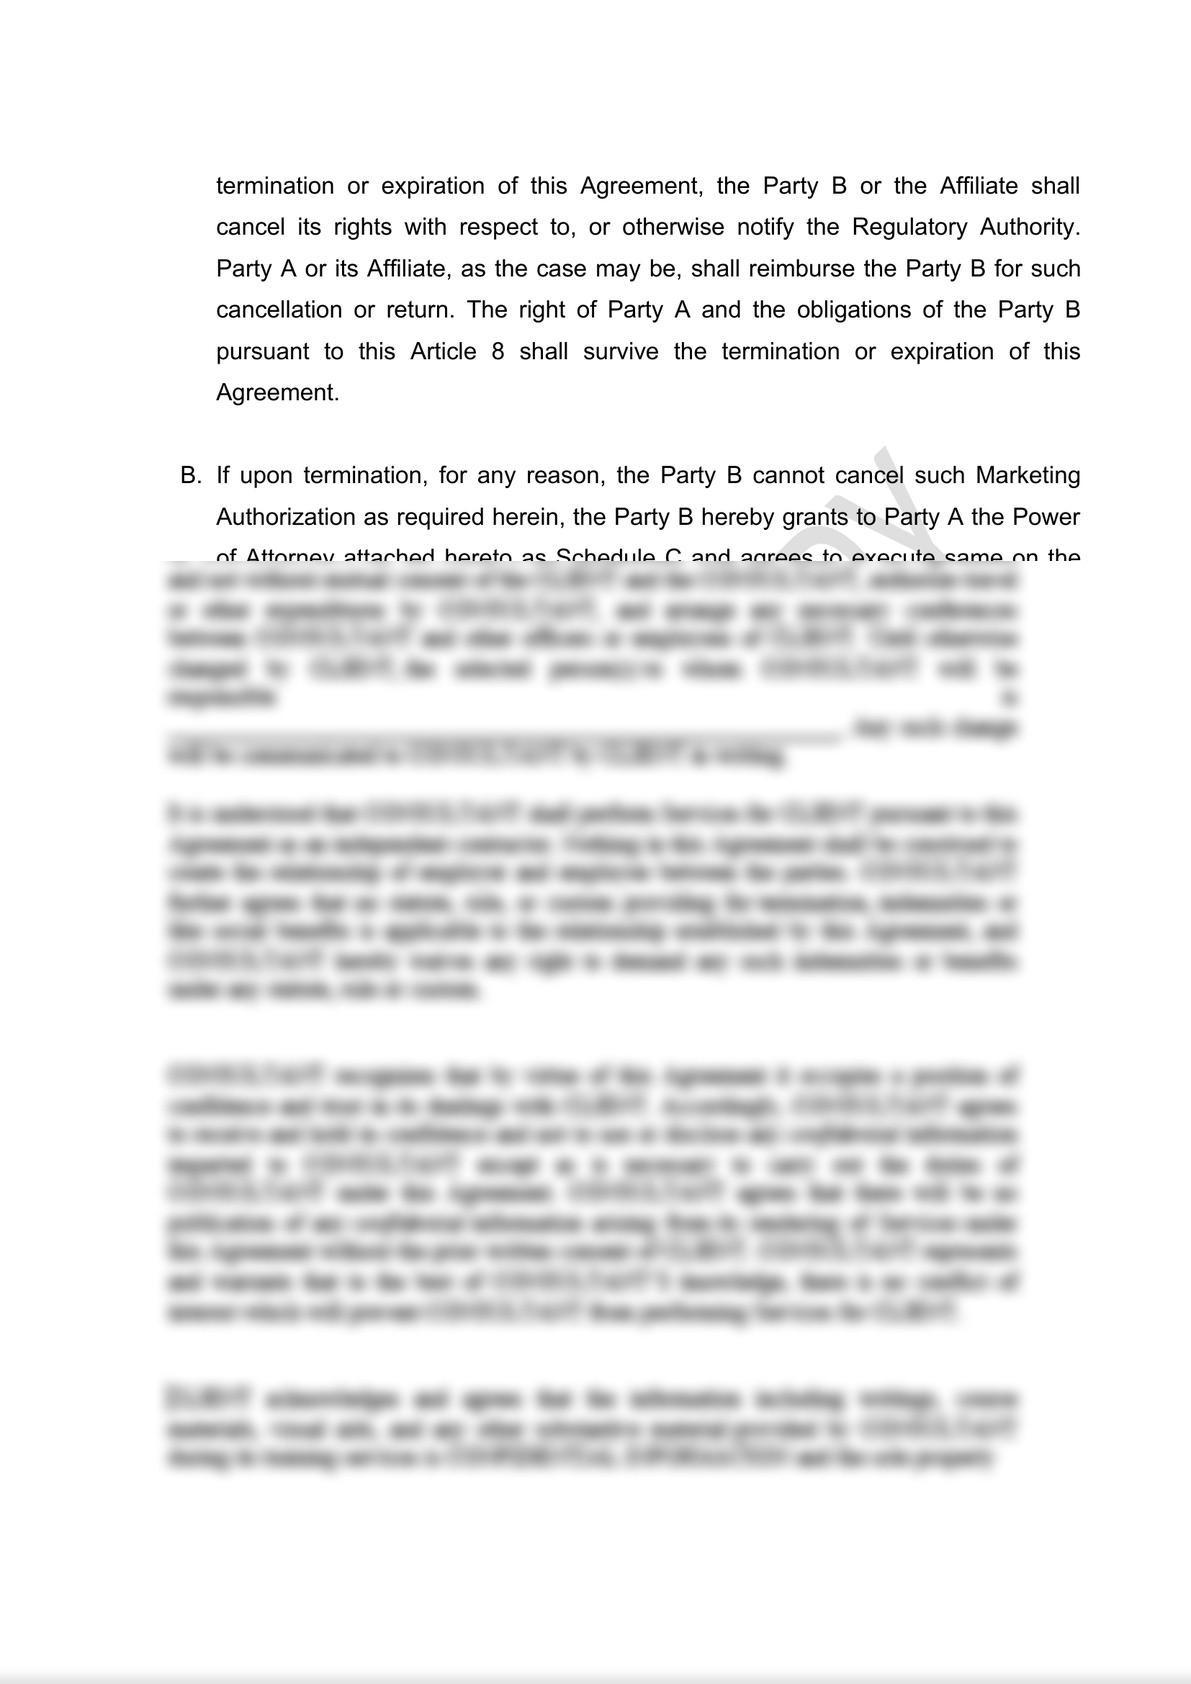 Distribution Agreement Draft (iii)-9